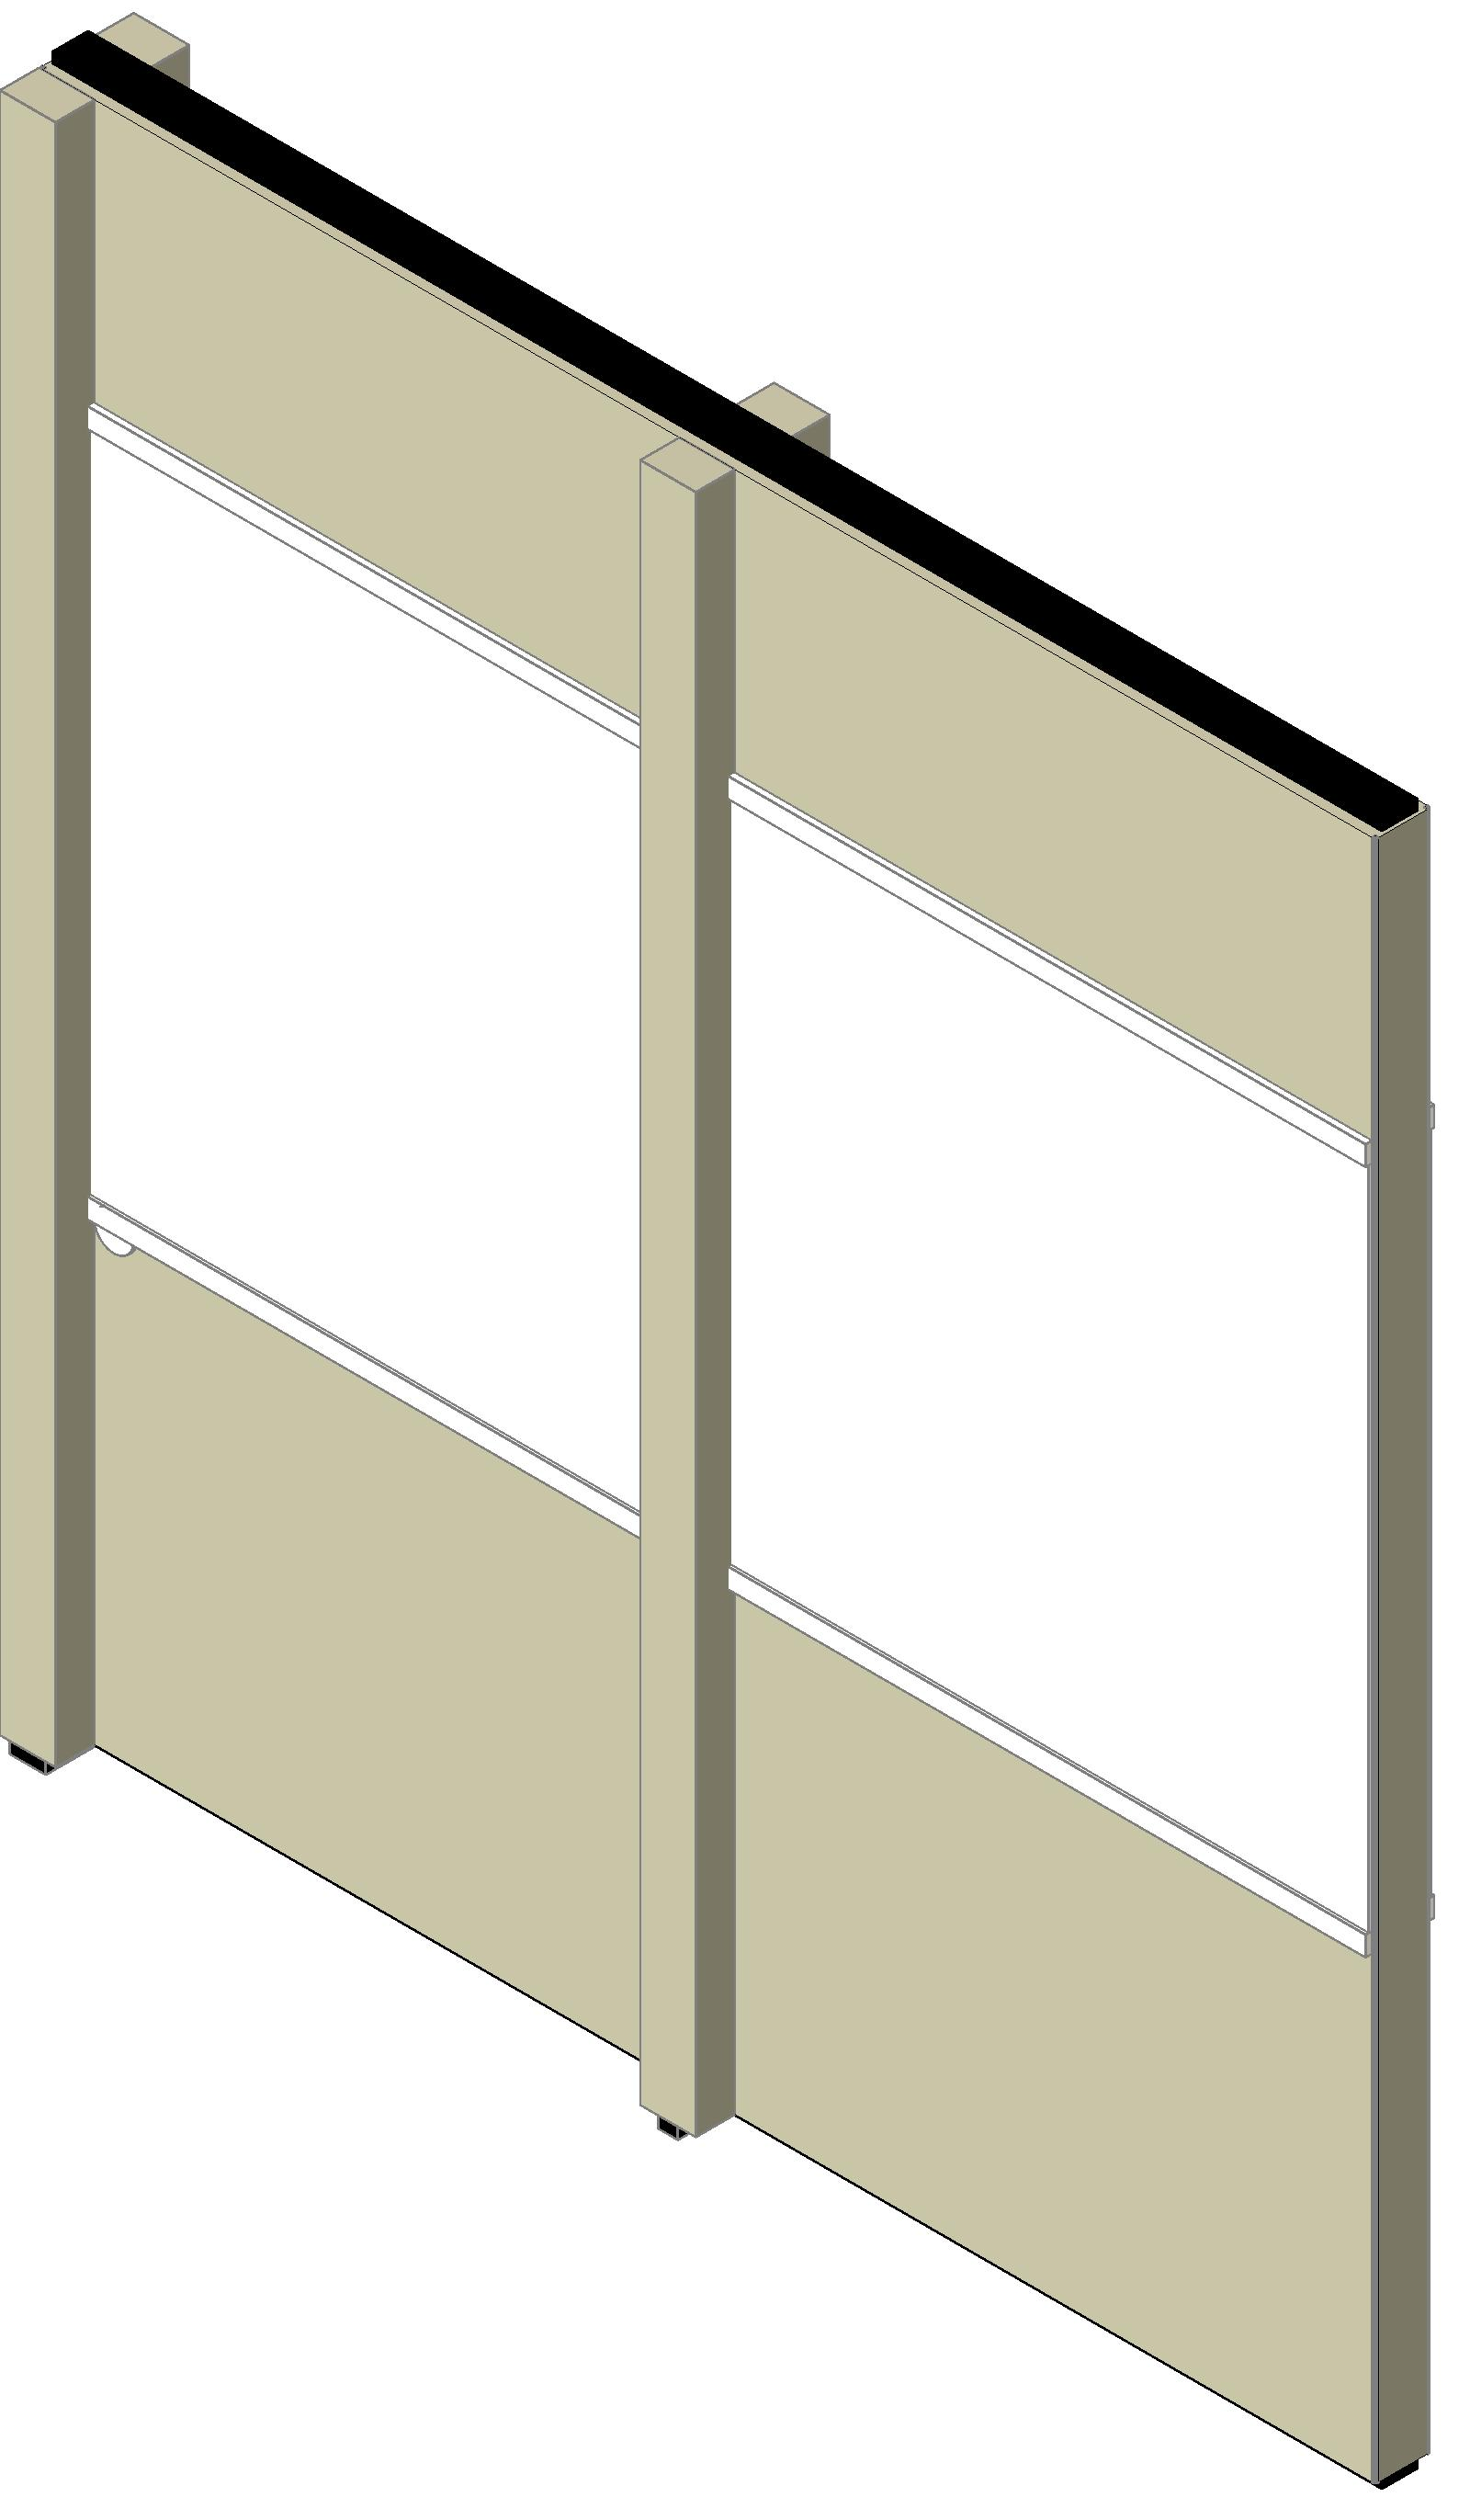 Modernfold Inc. BIM content  sc 1 st  Arcat & Modernfold Inc. Operable Partitions BIM Objects / Families